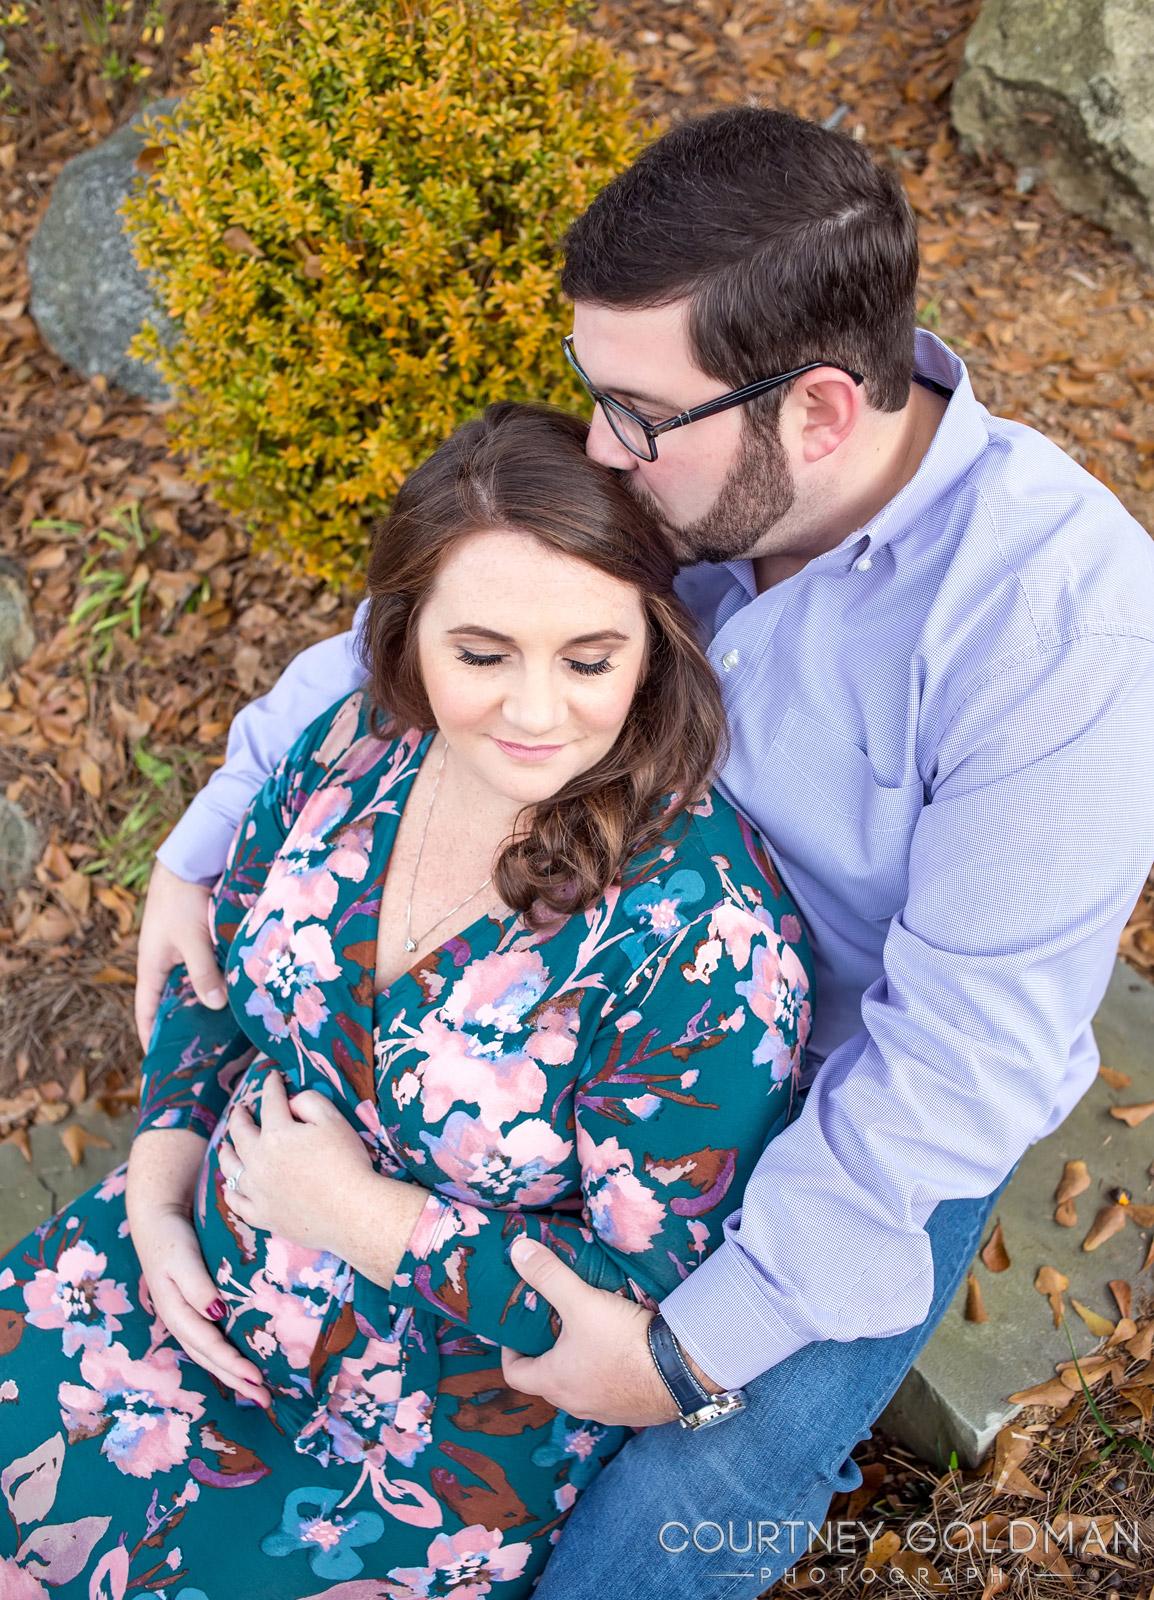 Atlanta Maternity and Newborn Photography by Courtney Goldman 01.jpg